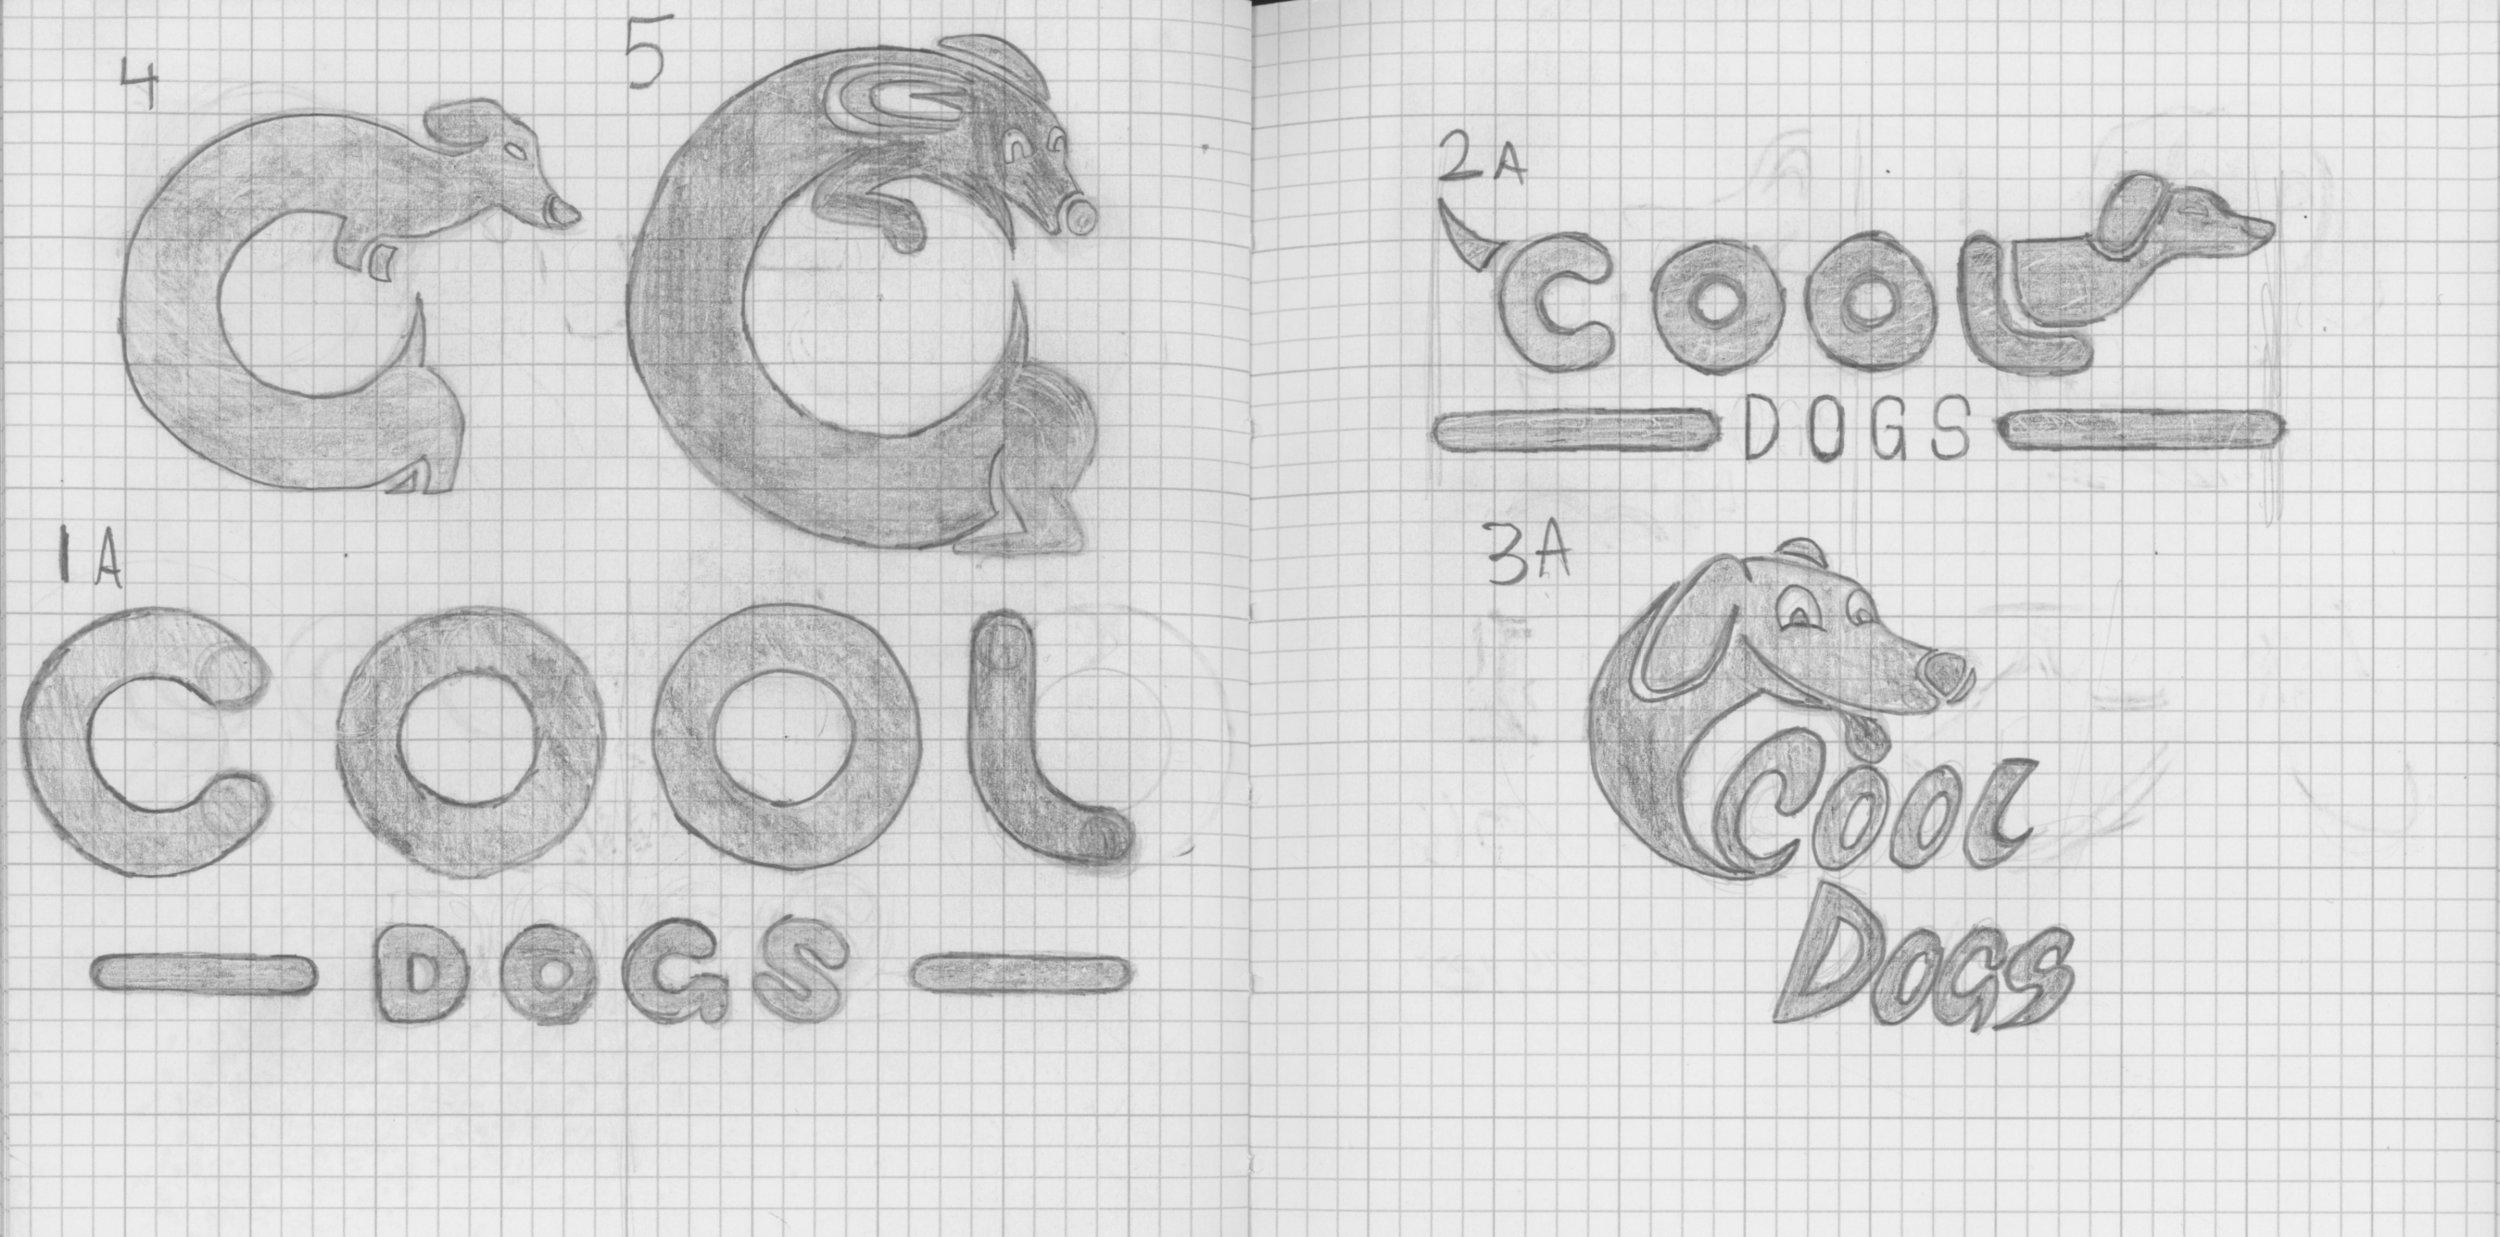 cooldogs-logo-branding-logodesign-hotdog-food-brand-orozcodesign-roberto-orozco-artist-graphicdesign-vegas-lasvegas-foodbrand-sketches1.jpg